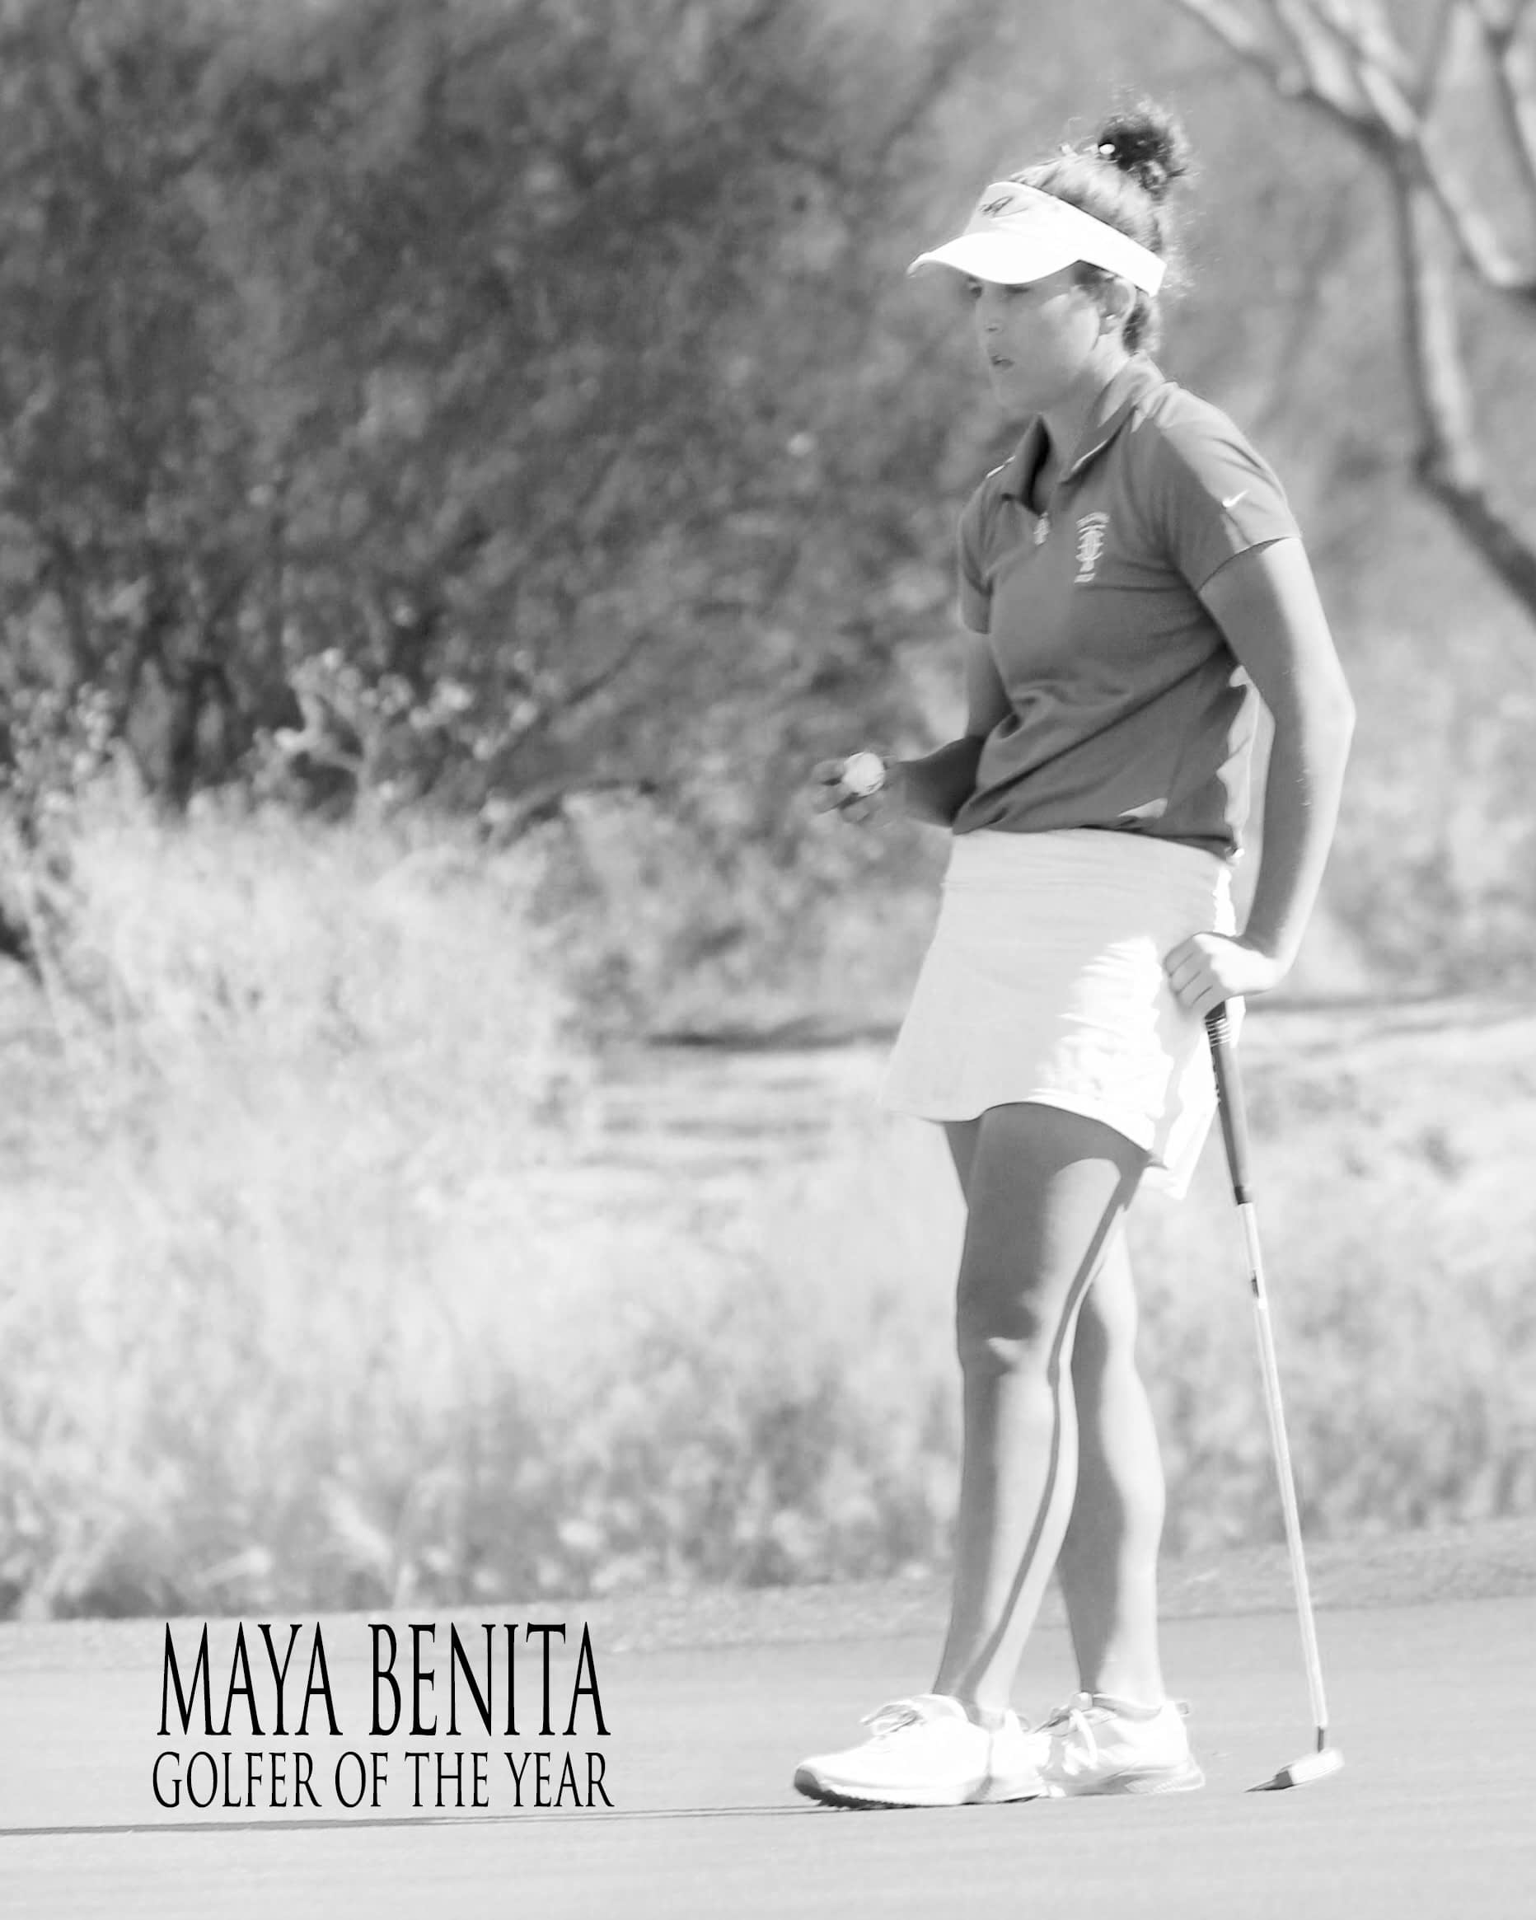 IMG_3298 Maya Benita golfer of the year 2019